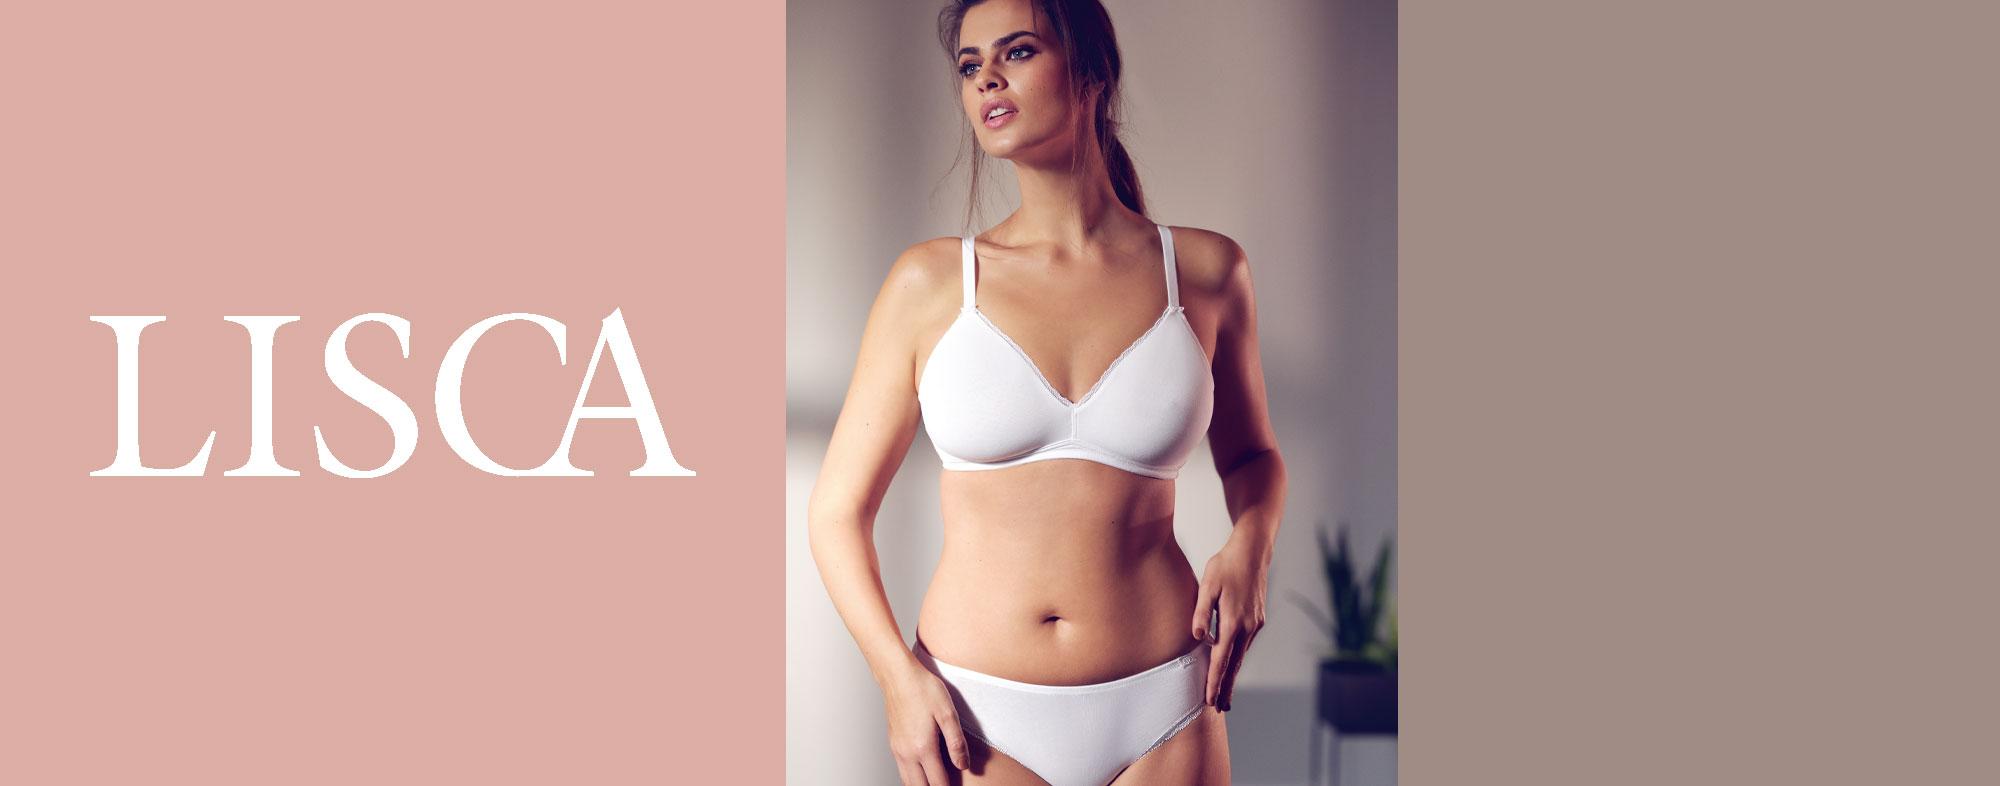 Lisca - Anja